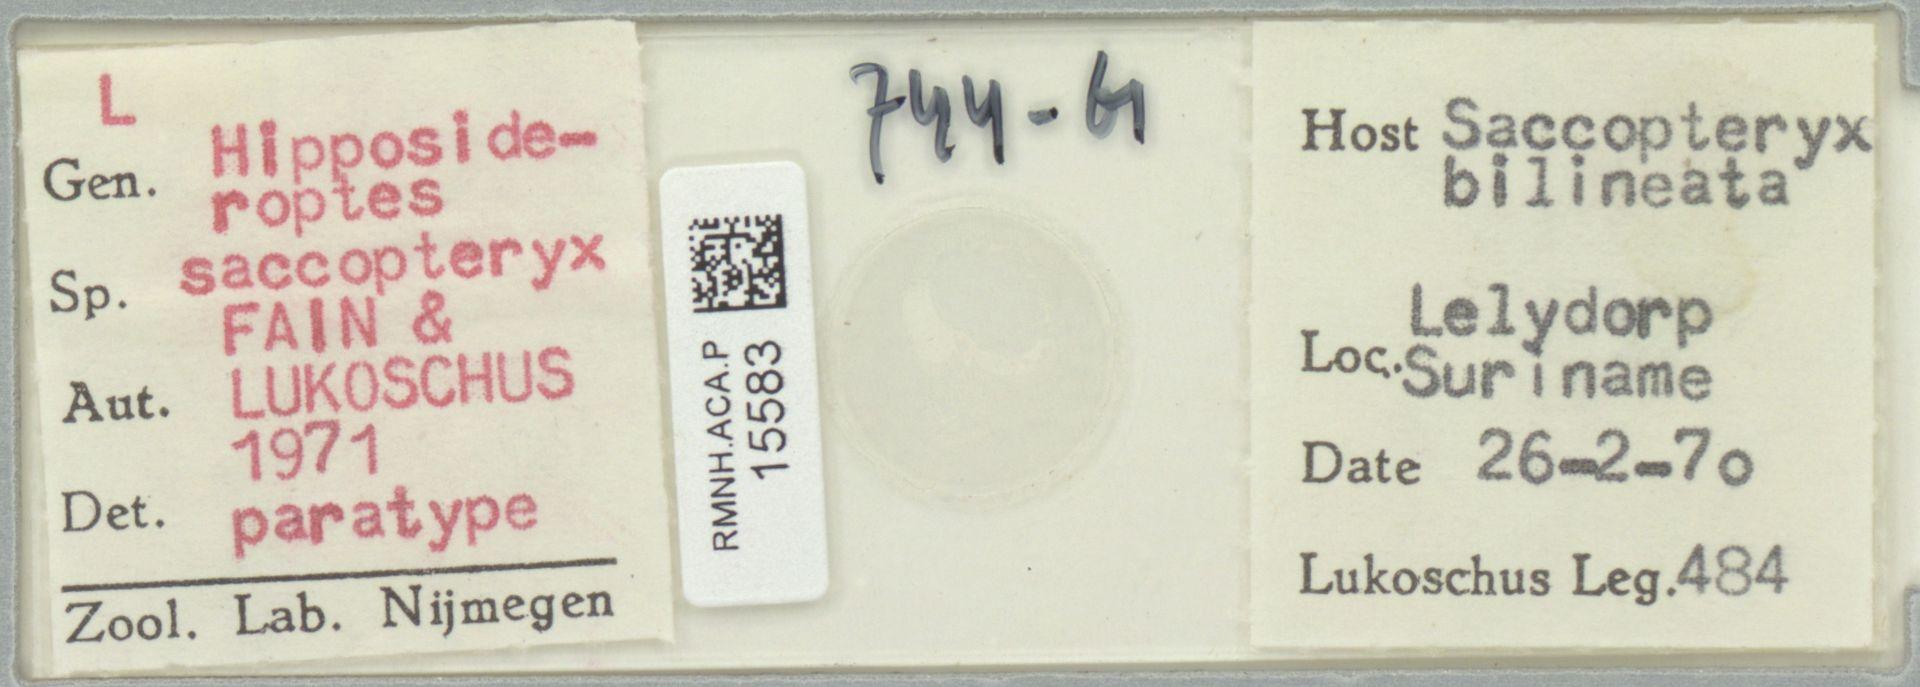 RMNH.ACA.P.15583   Hipposideroptes saccopteryx